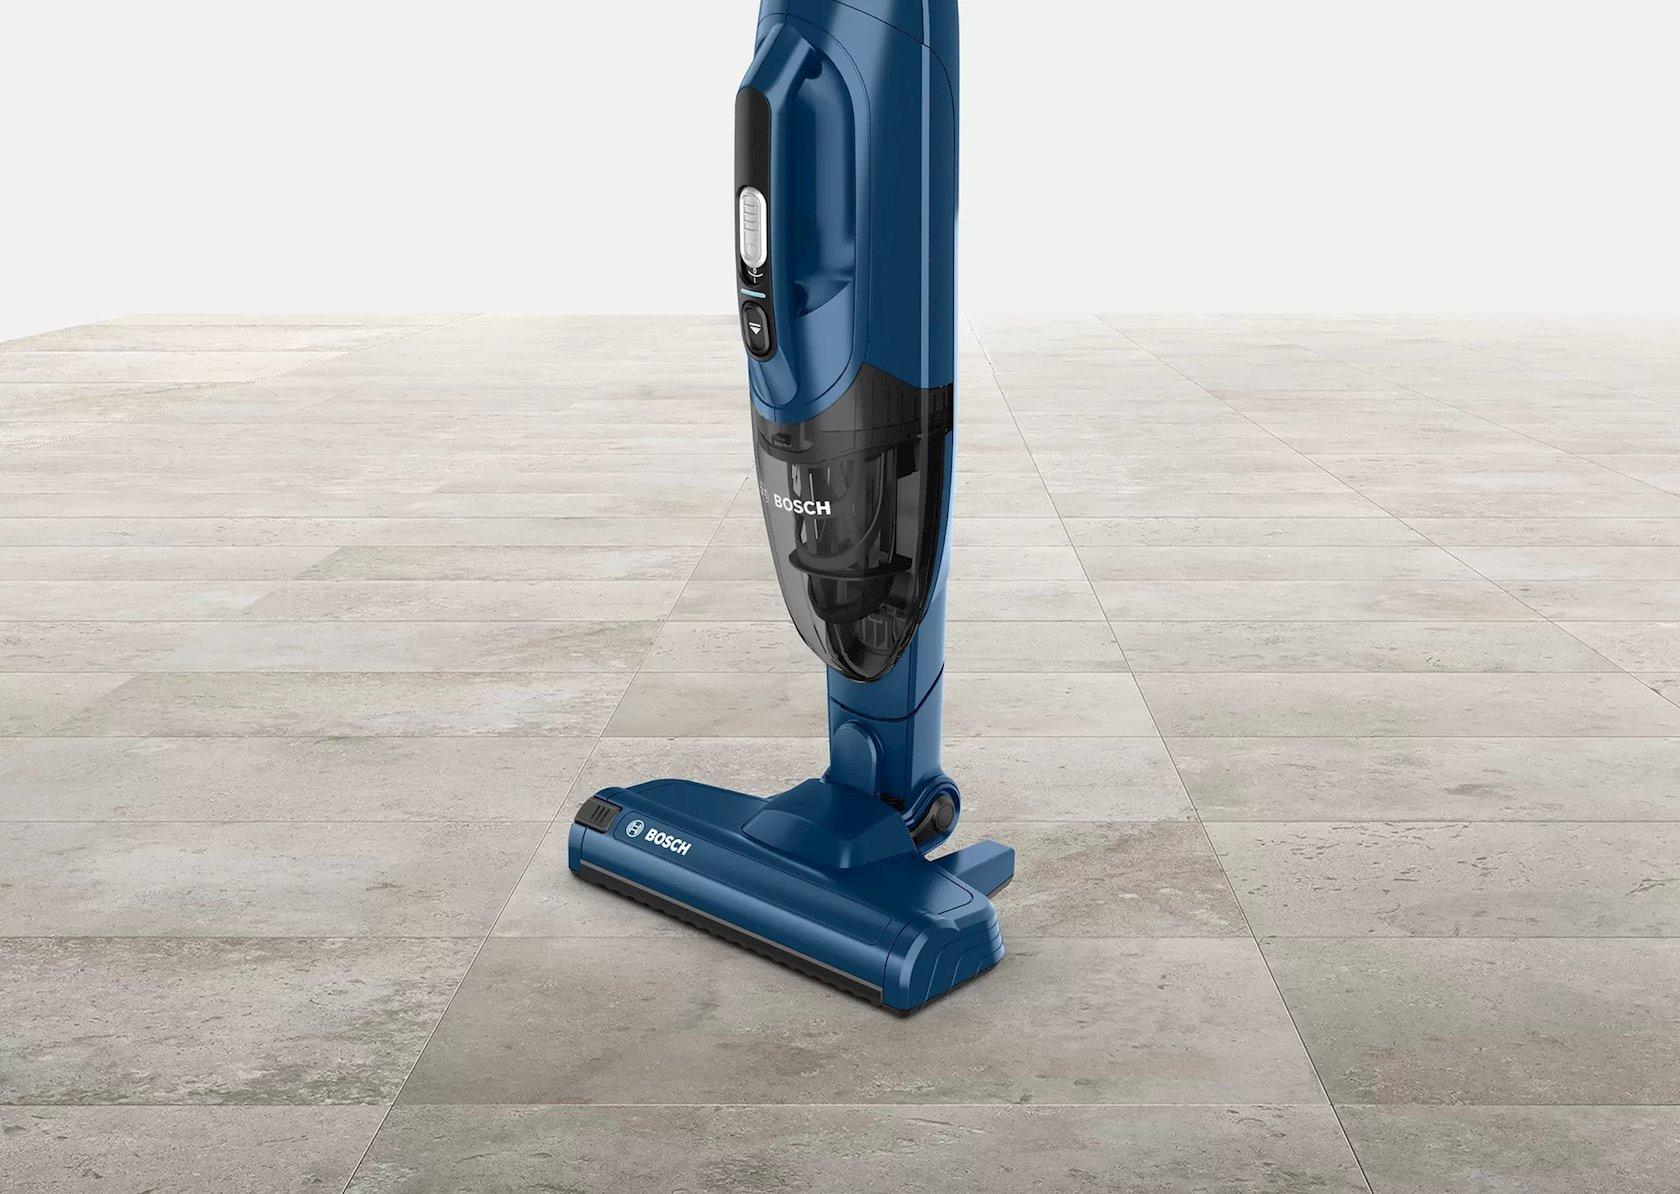 Vertikal akkumulyator tozsoranı Bosch BCHF2MX20